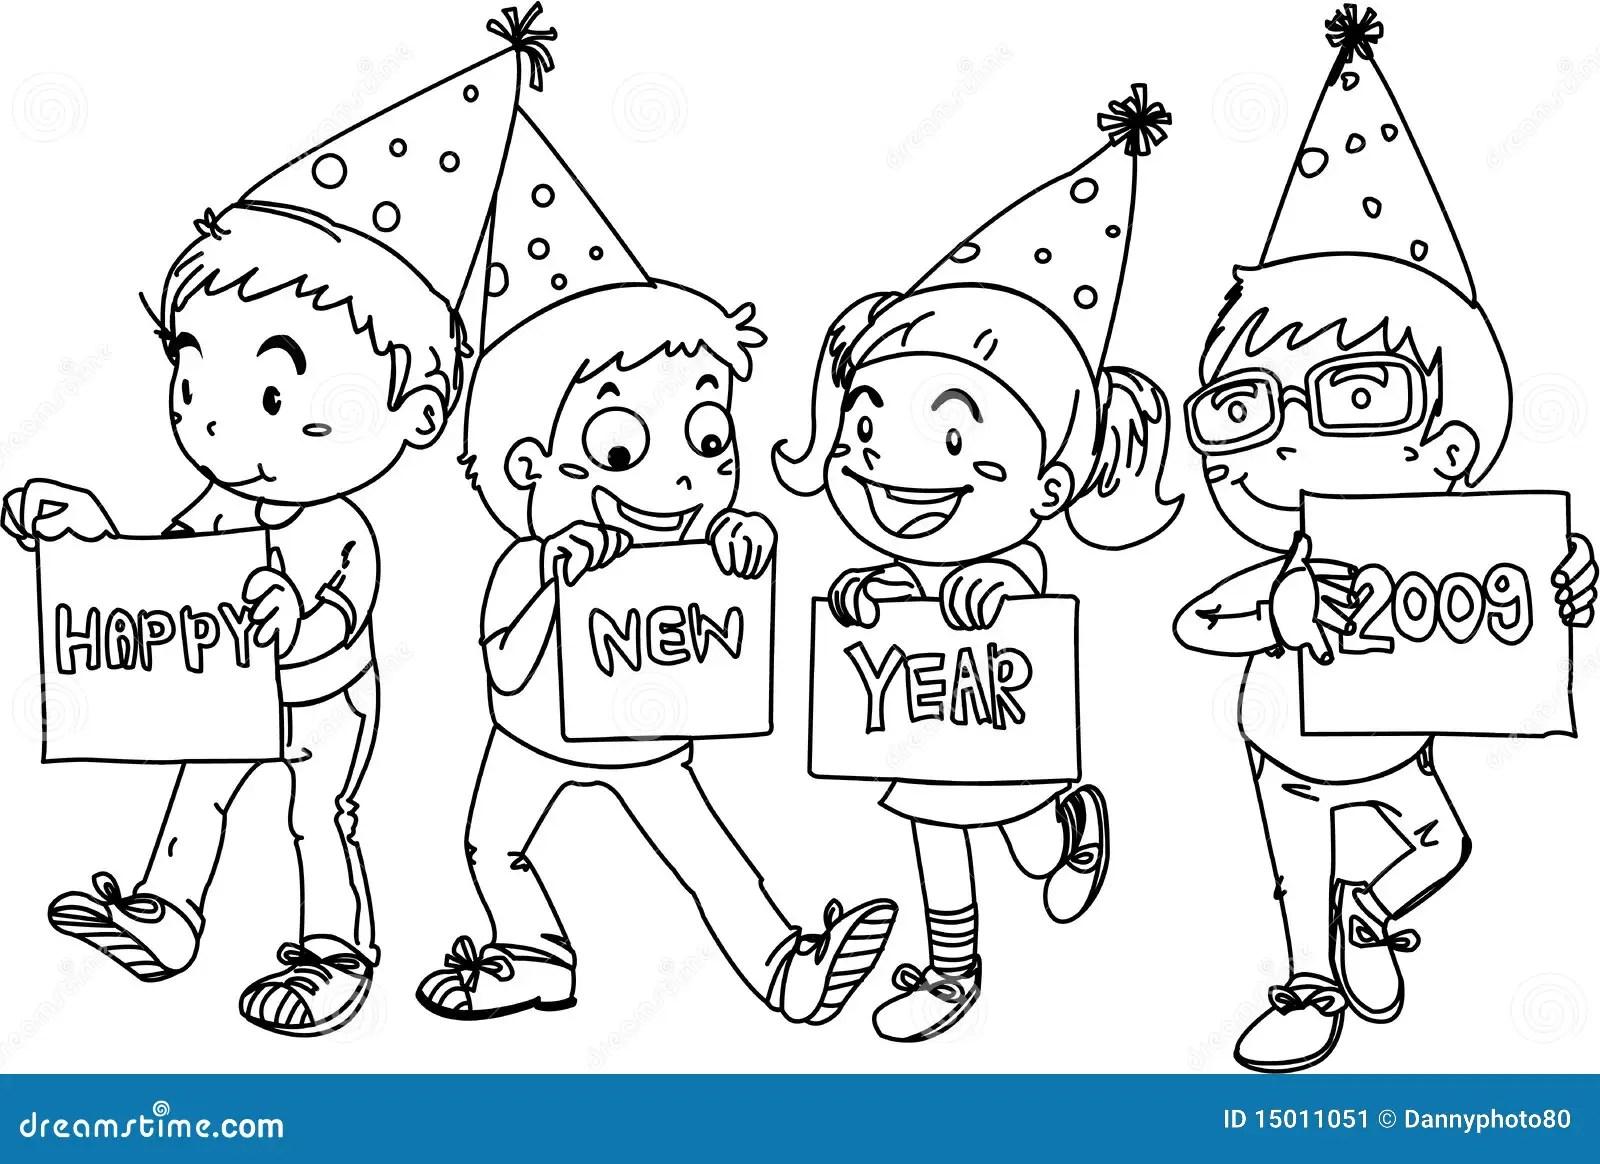 Kids Wishing Happy New Year Stock Vector Illustration Of